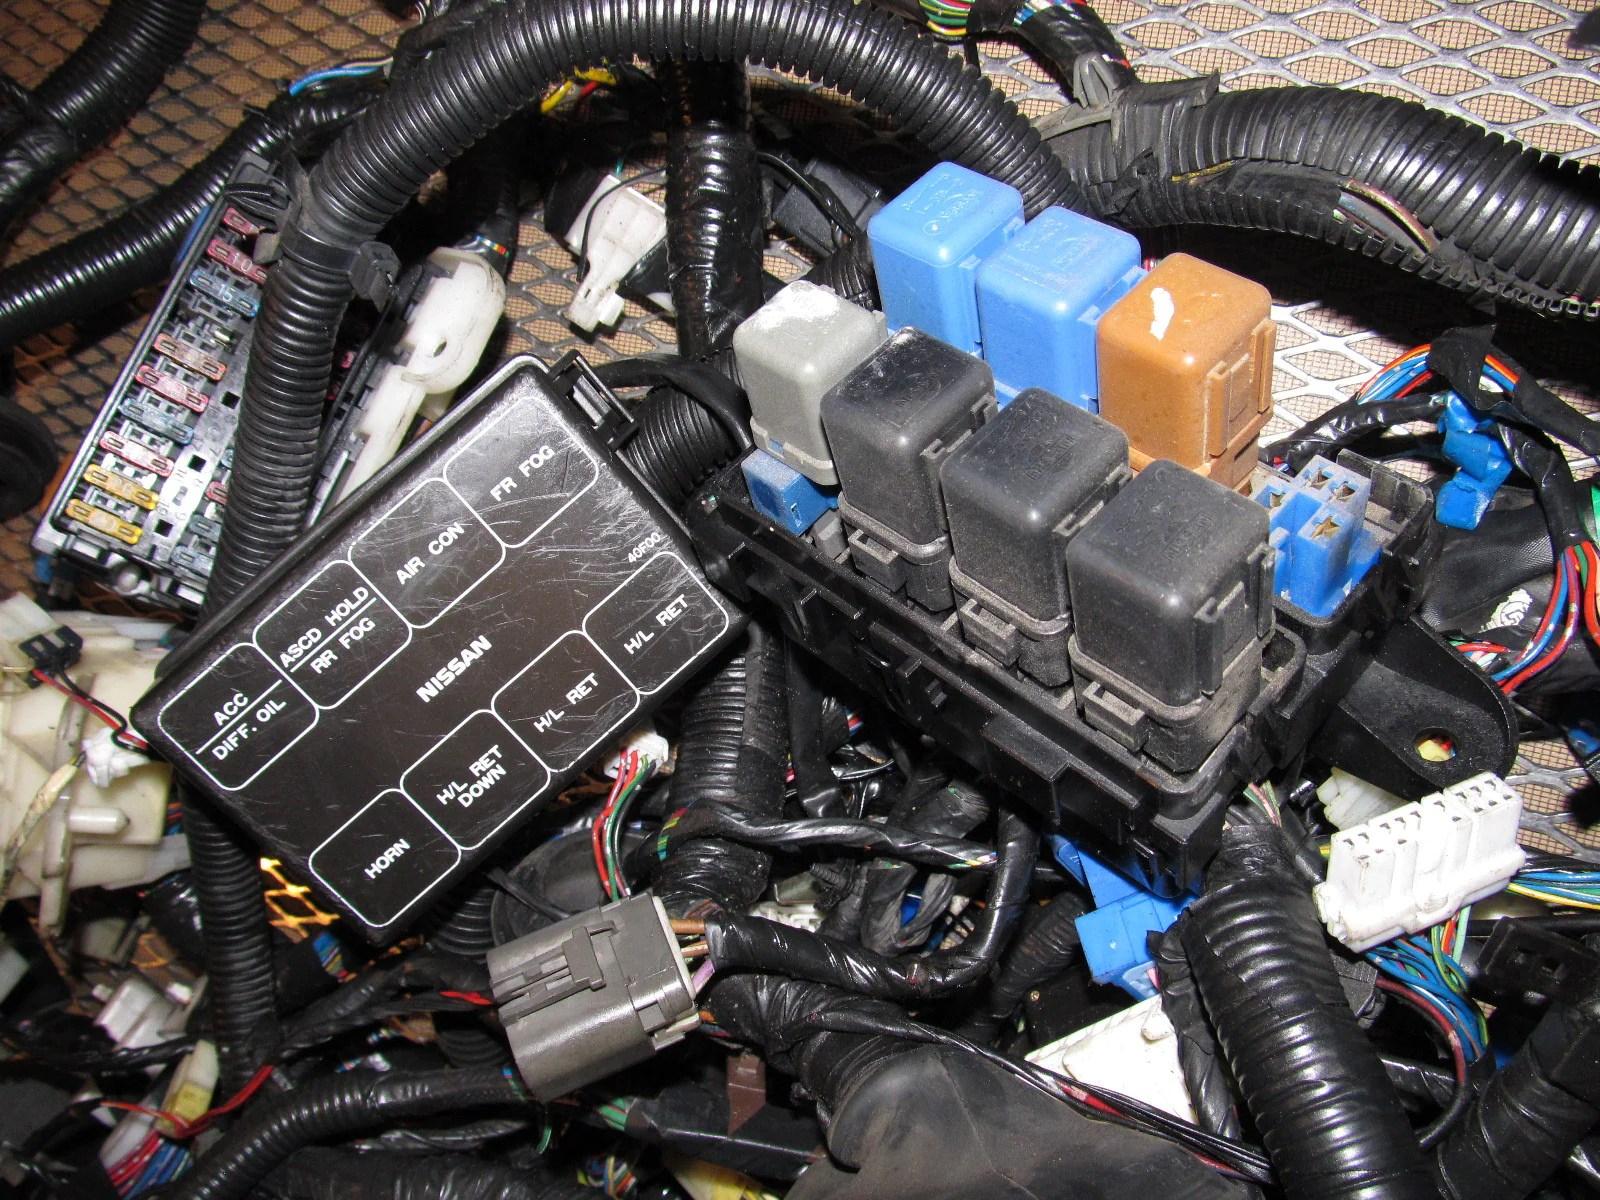 small resolution of 90 240sx fuse box schematic wiring diagrams m3 fuse box s13 240 fuse box